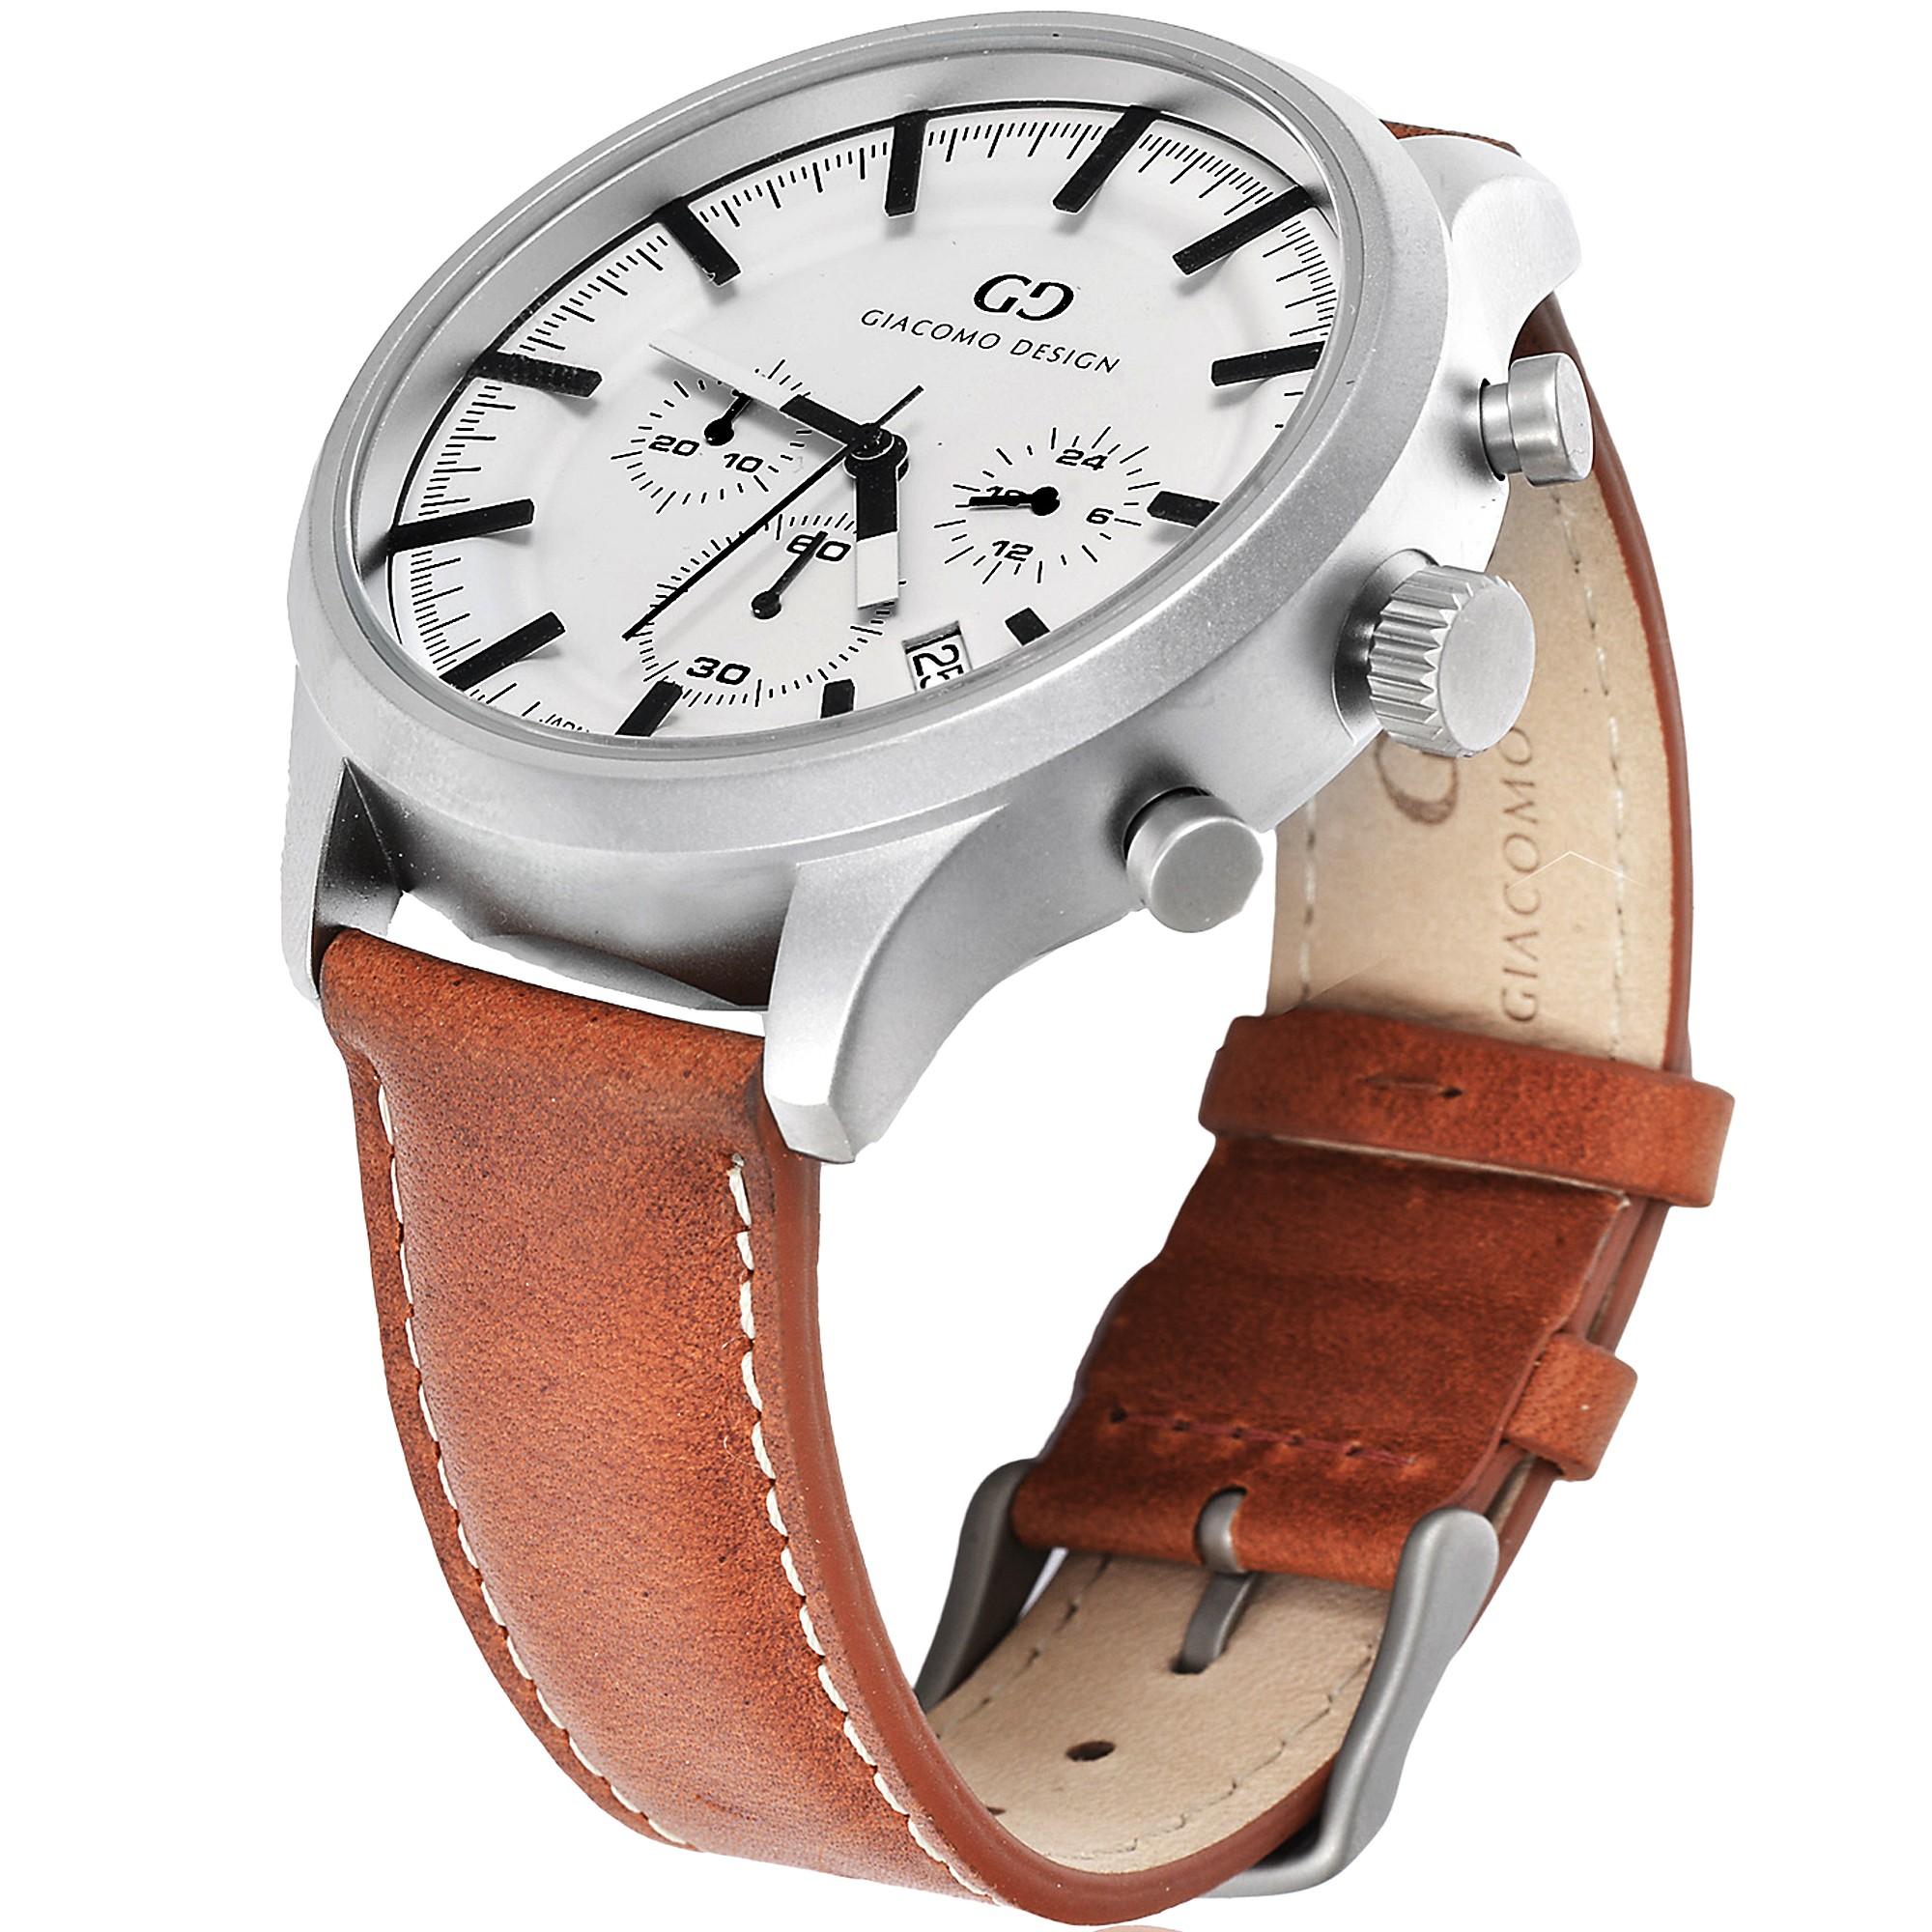 Giacomo Design Classico White/Brown Leather